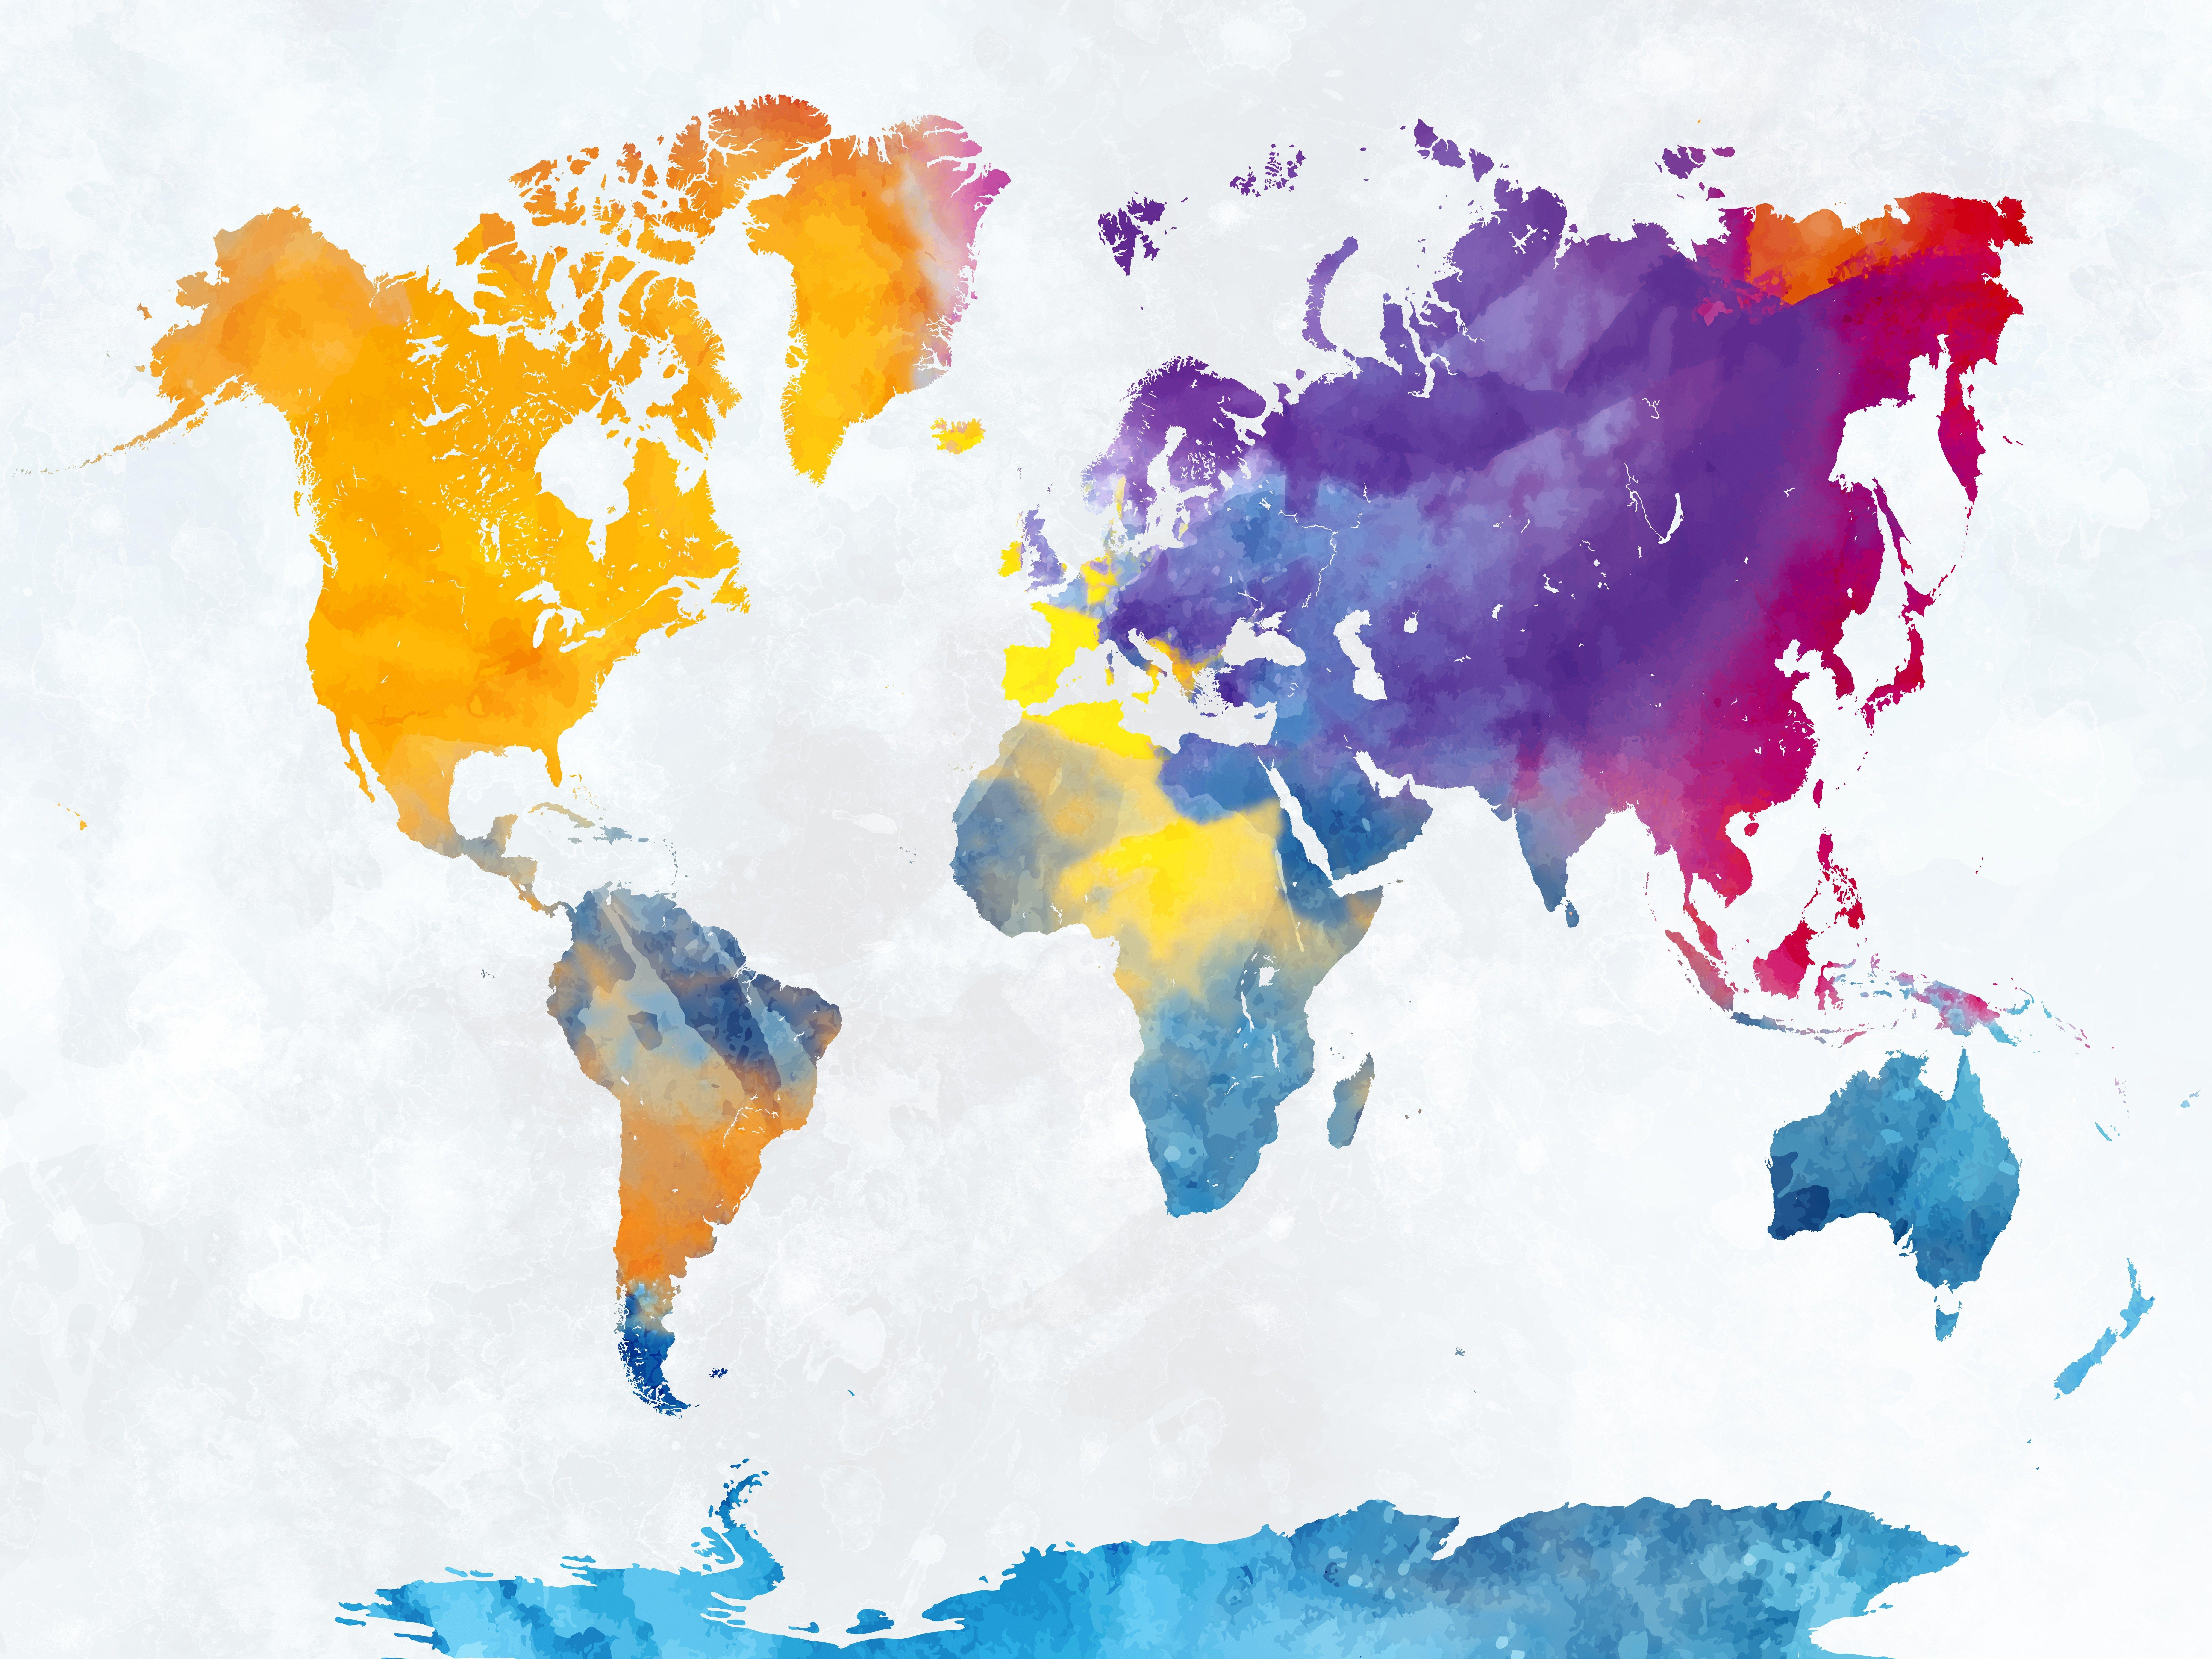 45 Watercolor World Map Desktop Wallpapers Download At Wallpaperbro Water Color World Map Color World Map World Map Wallpaper